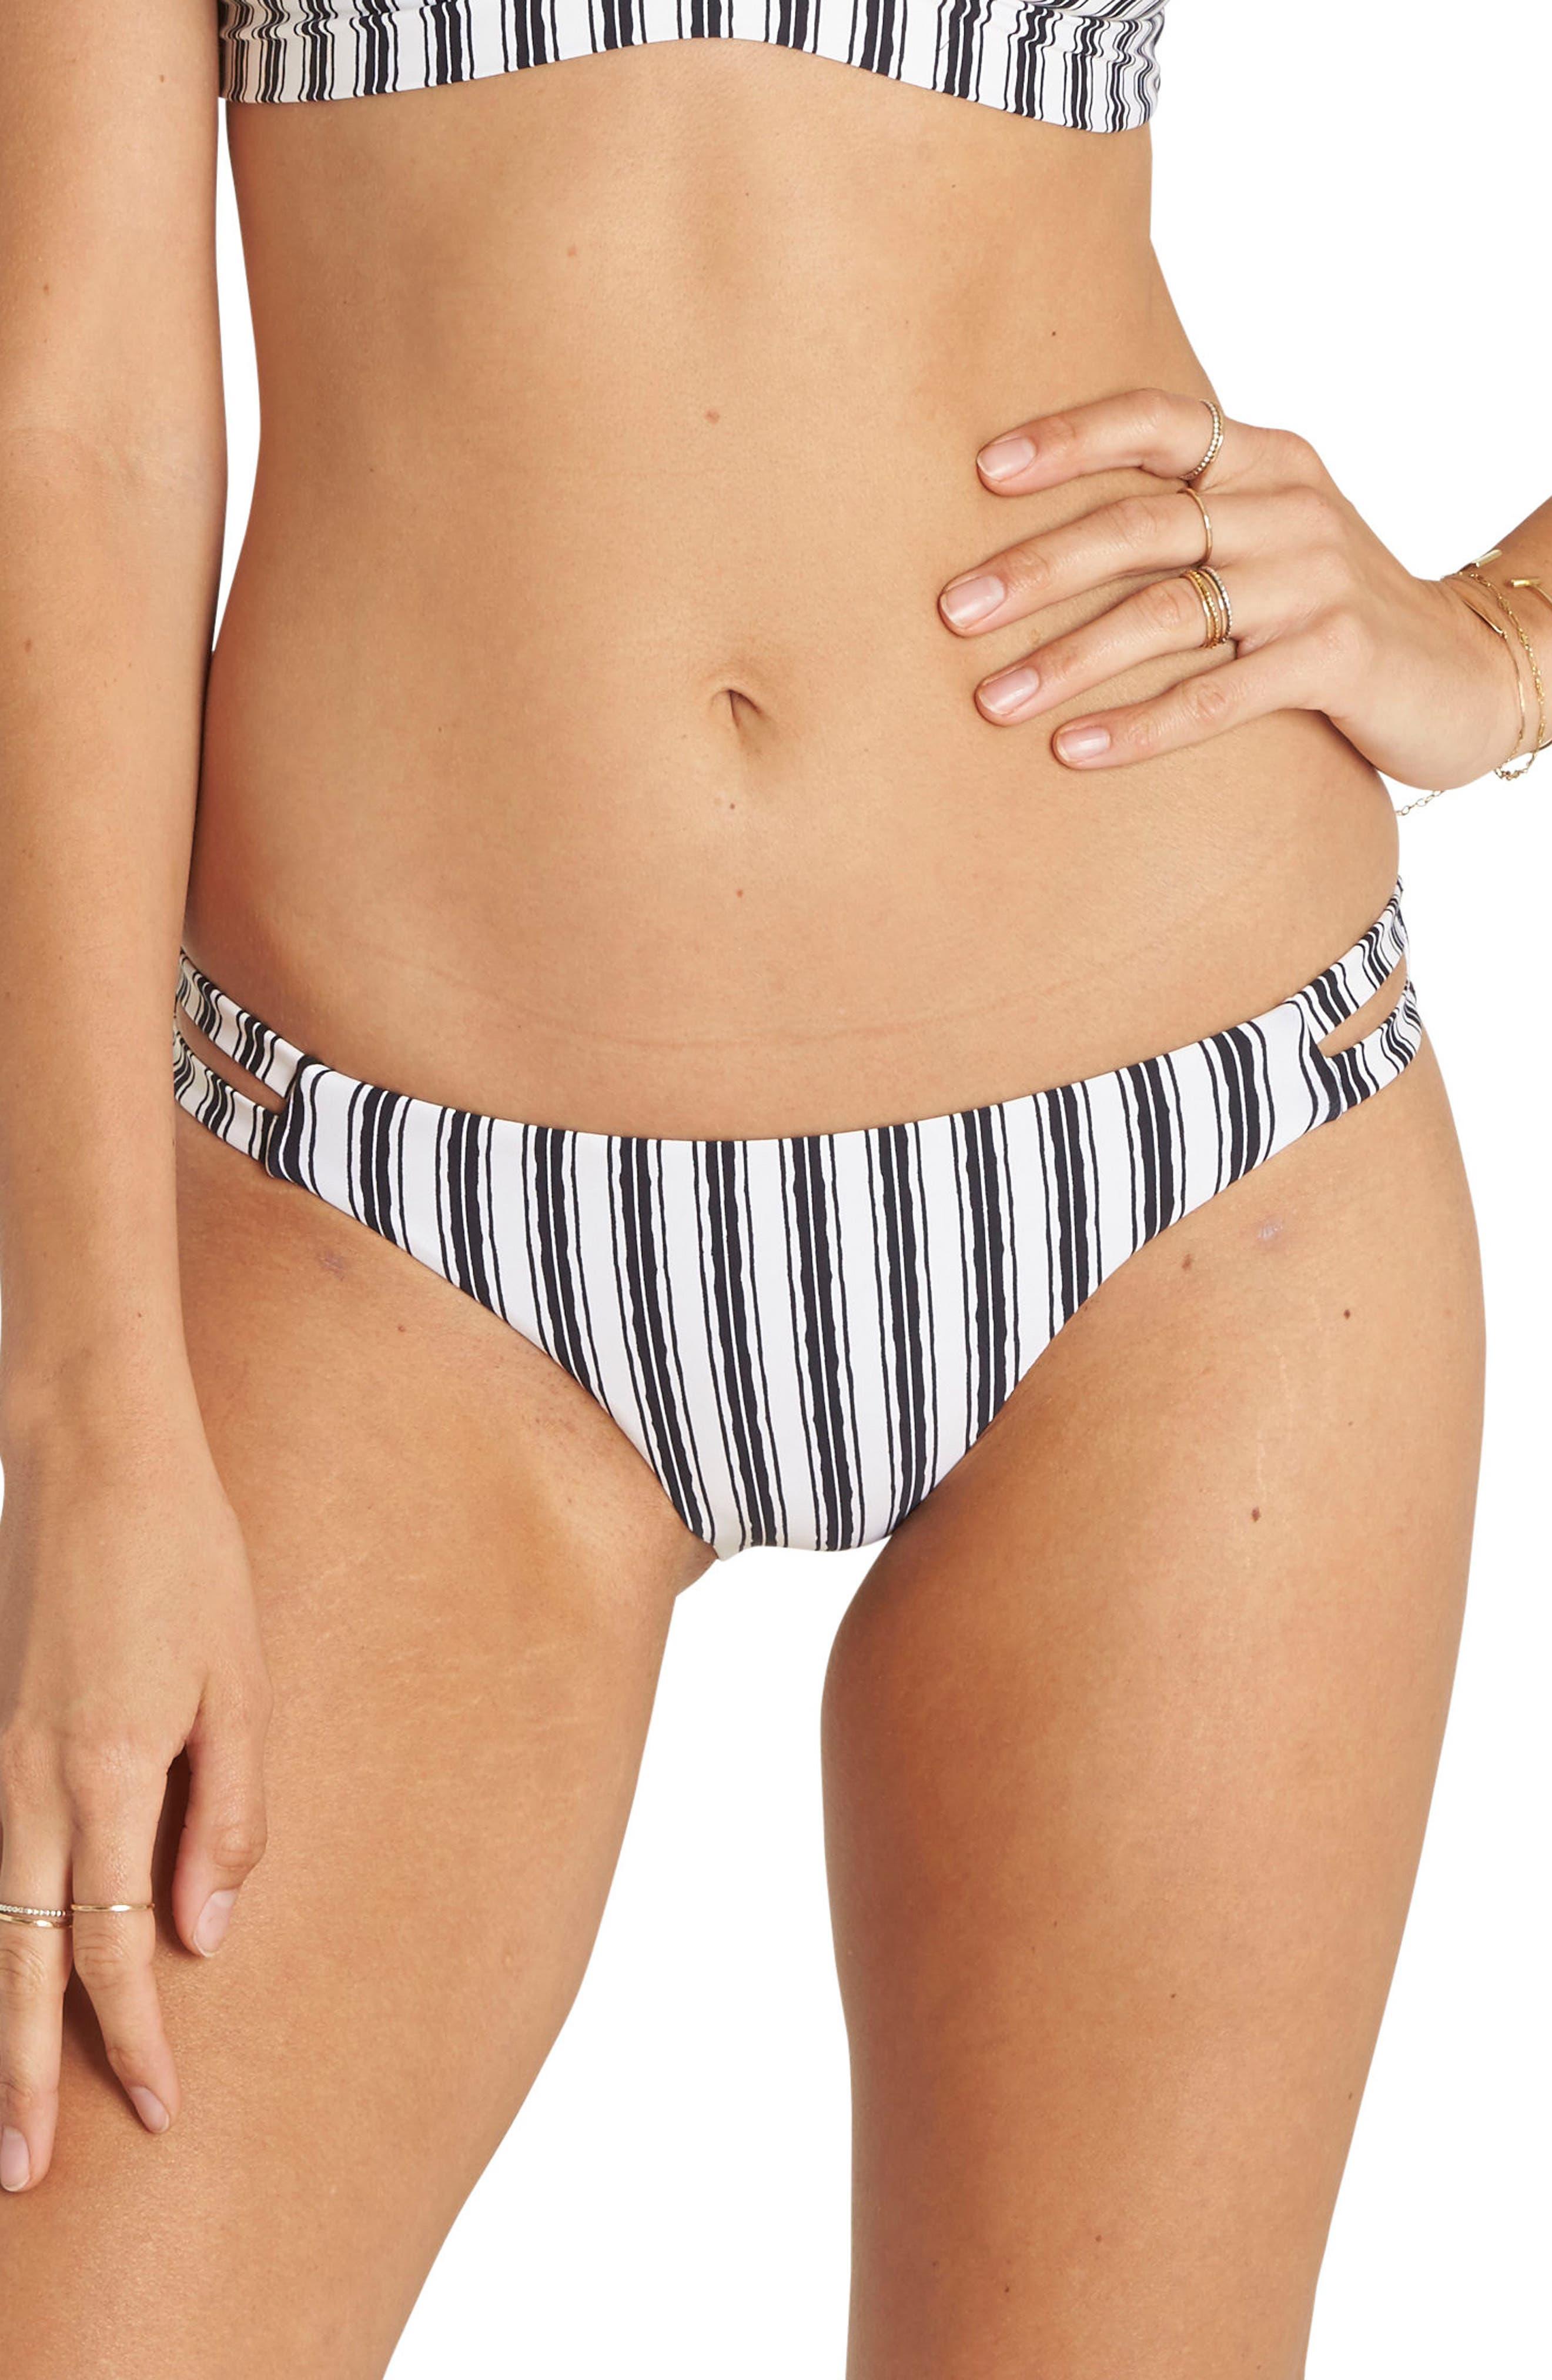 Get in Line Lowrider Bikini Bottoms,                         Main,                         color,